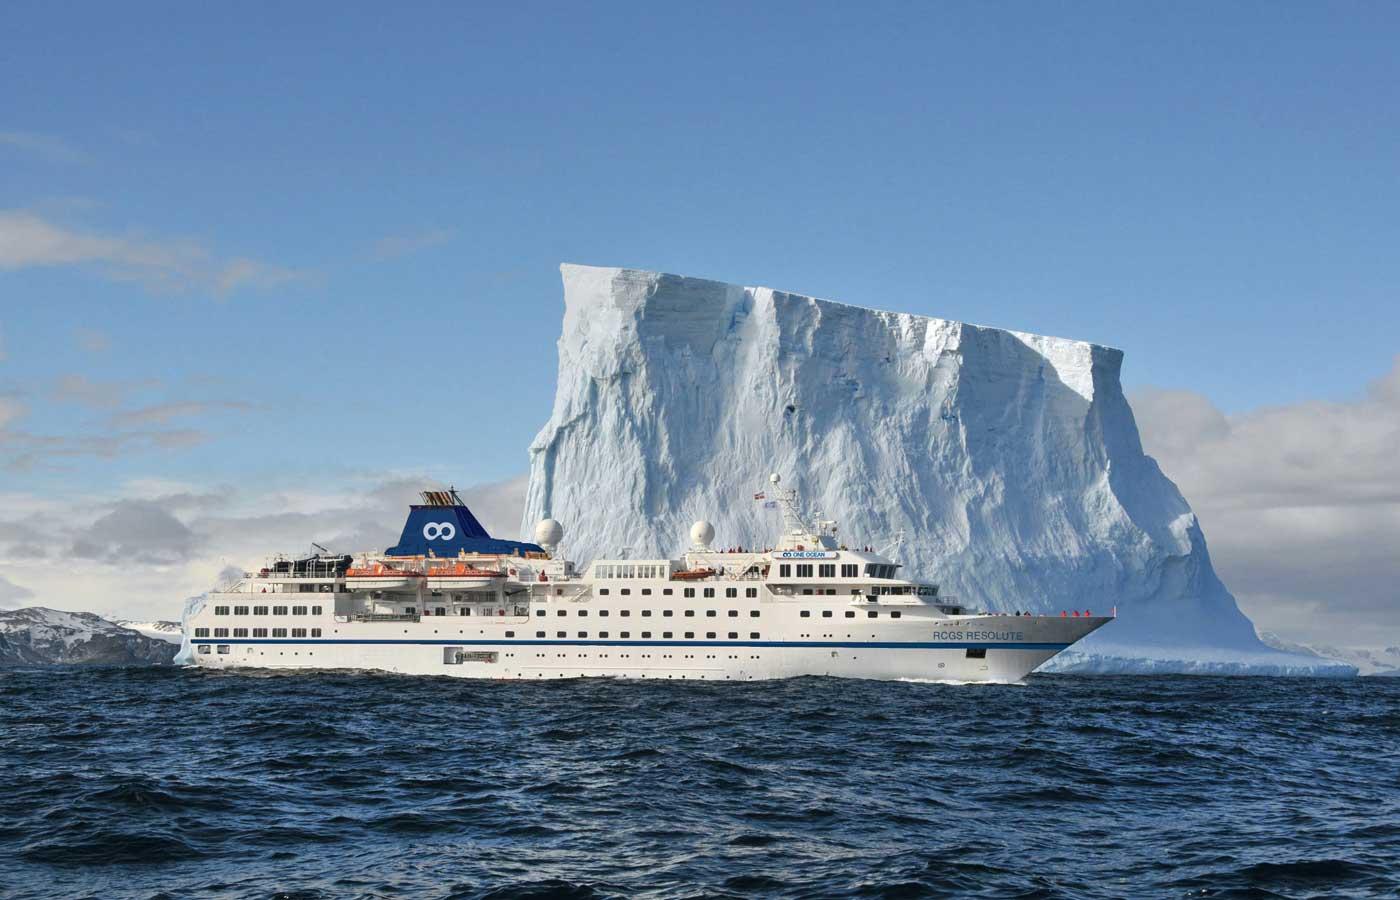 RCGS Resolute Vessel, Holidays to Antarctica